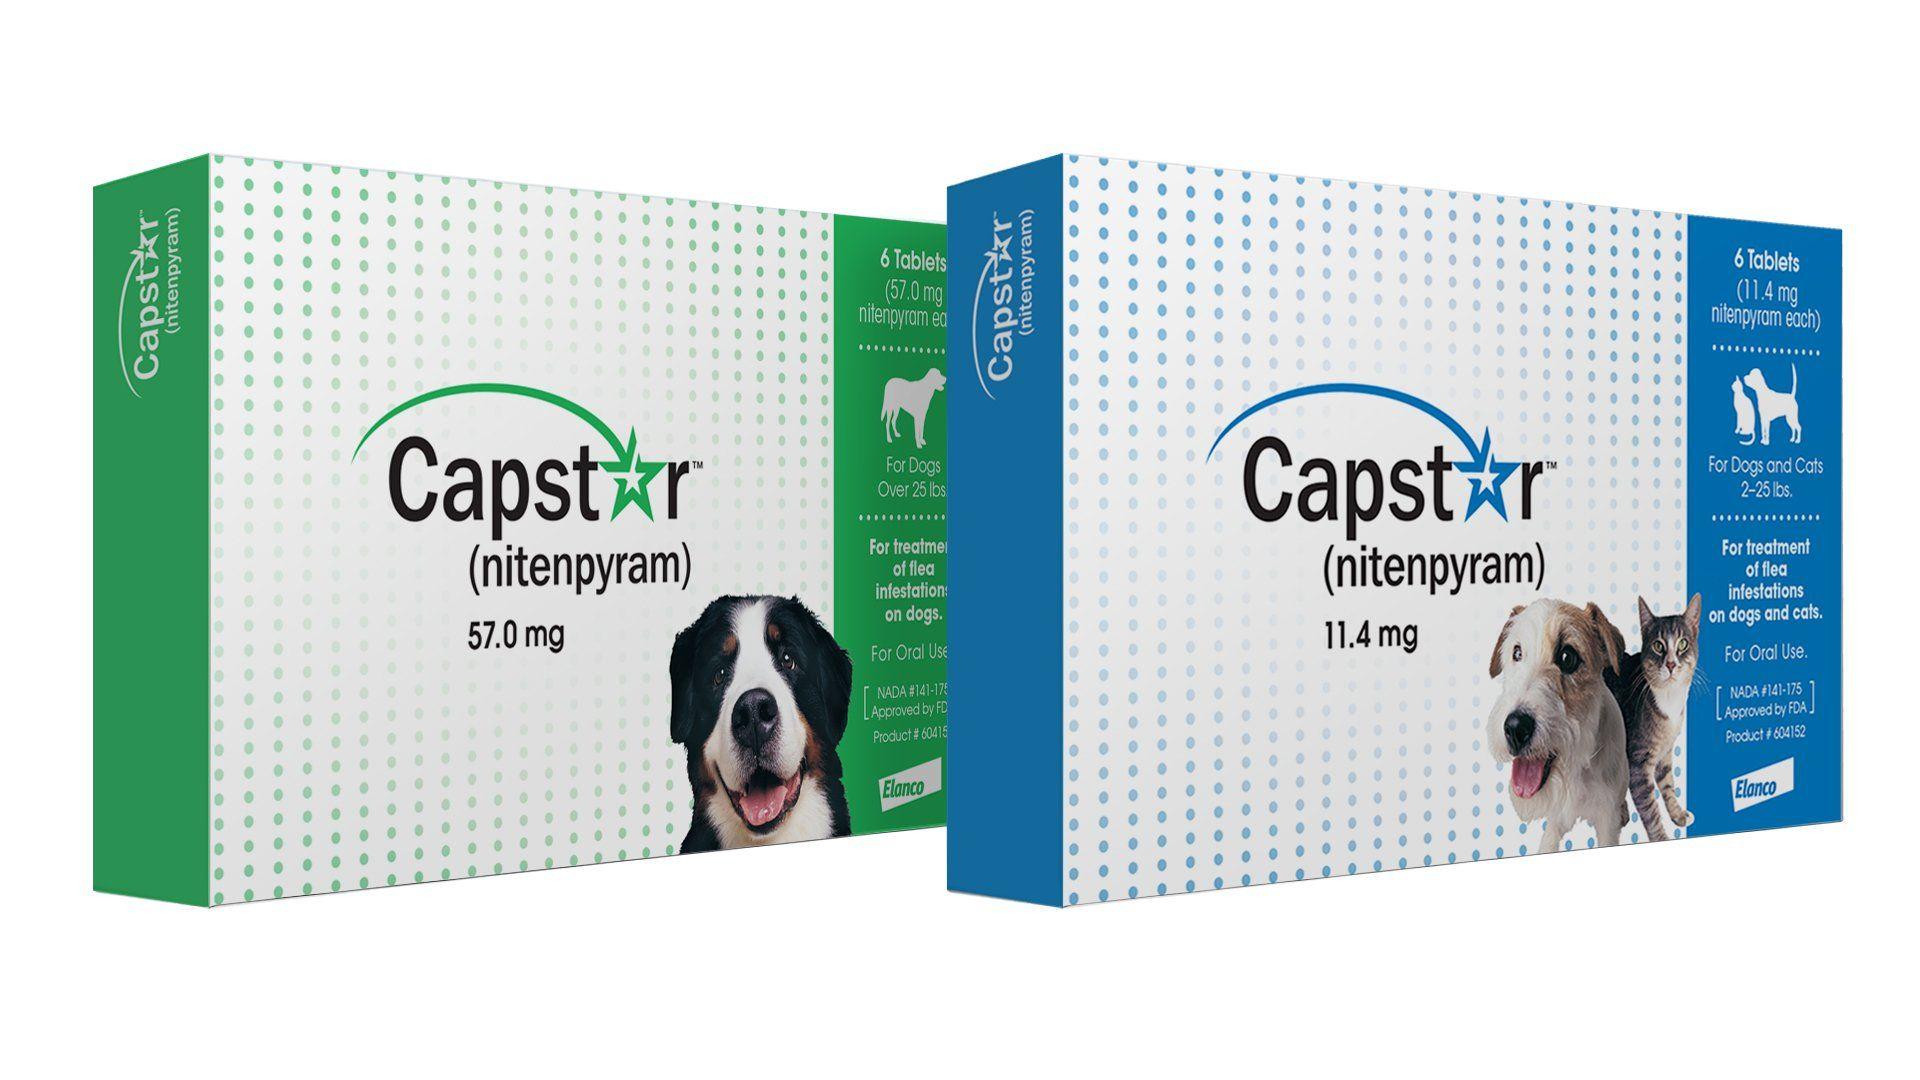 Novartis Capstar Flea Tablets For Dogs And Cats Flea Capstar Novartis Cats With Images Flea Treatment Fleas Dog Cat